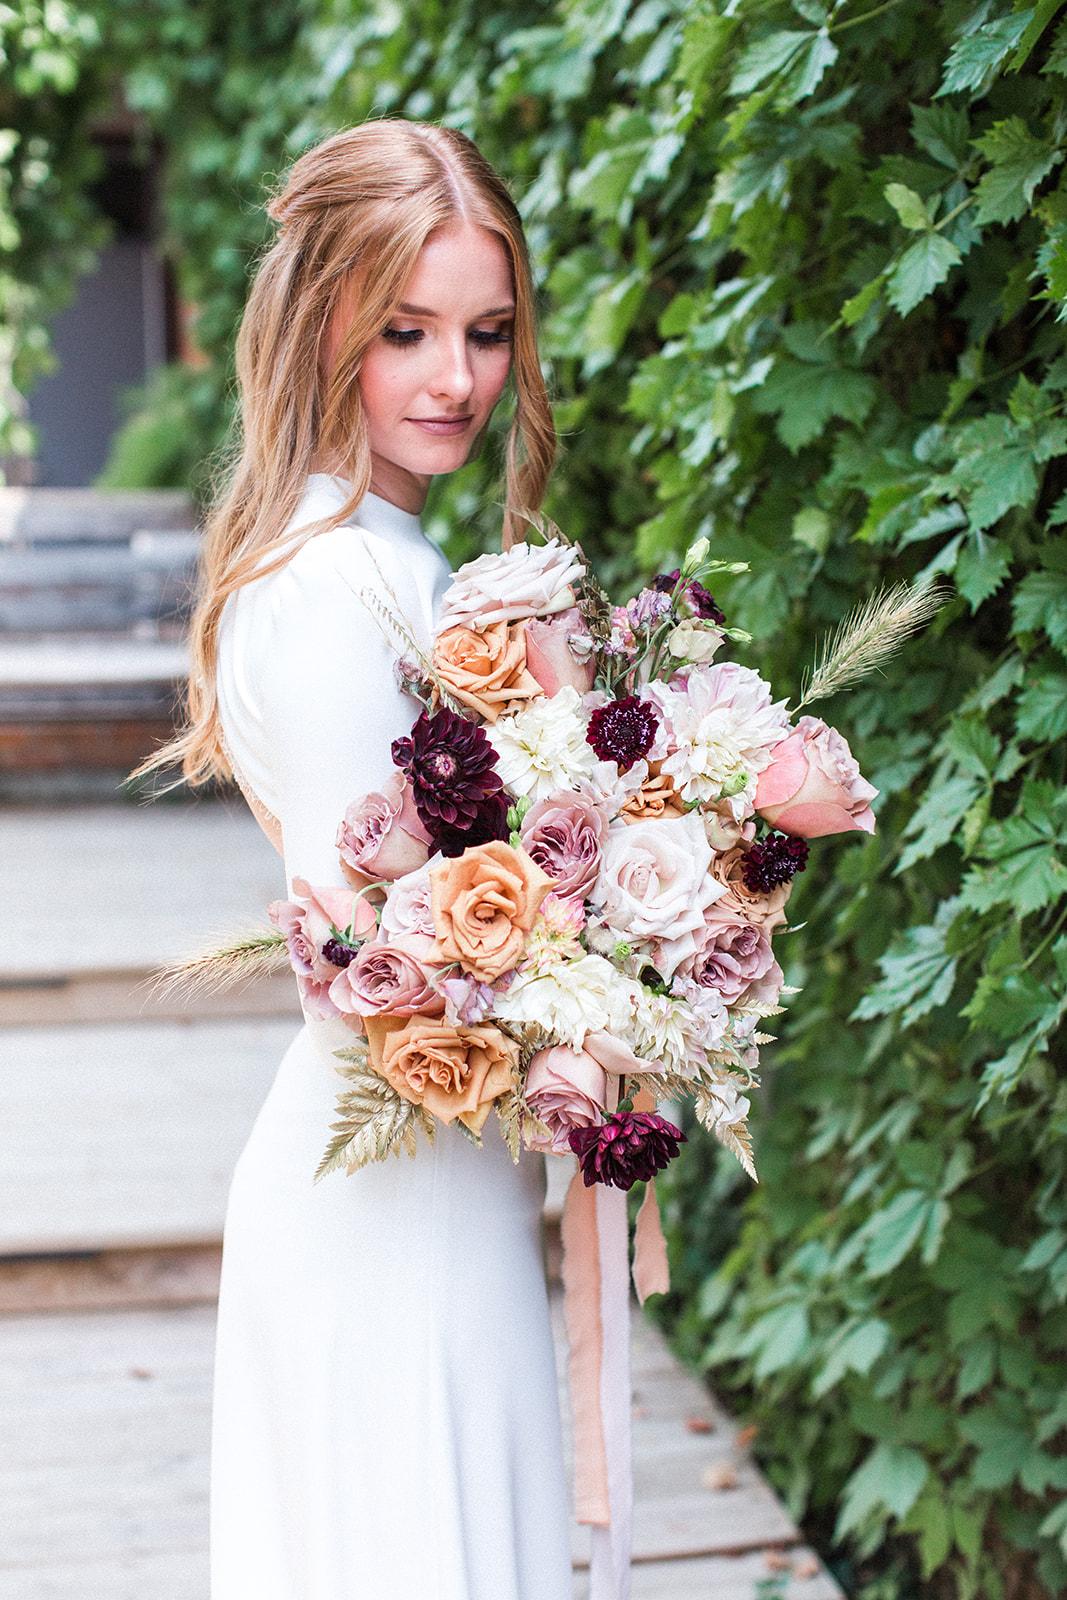 Romantic wedding bouquet: Fall Garden Wedding featured on Alexa Kay Events